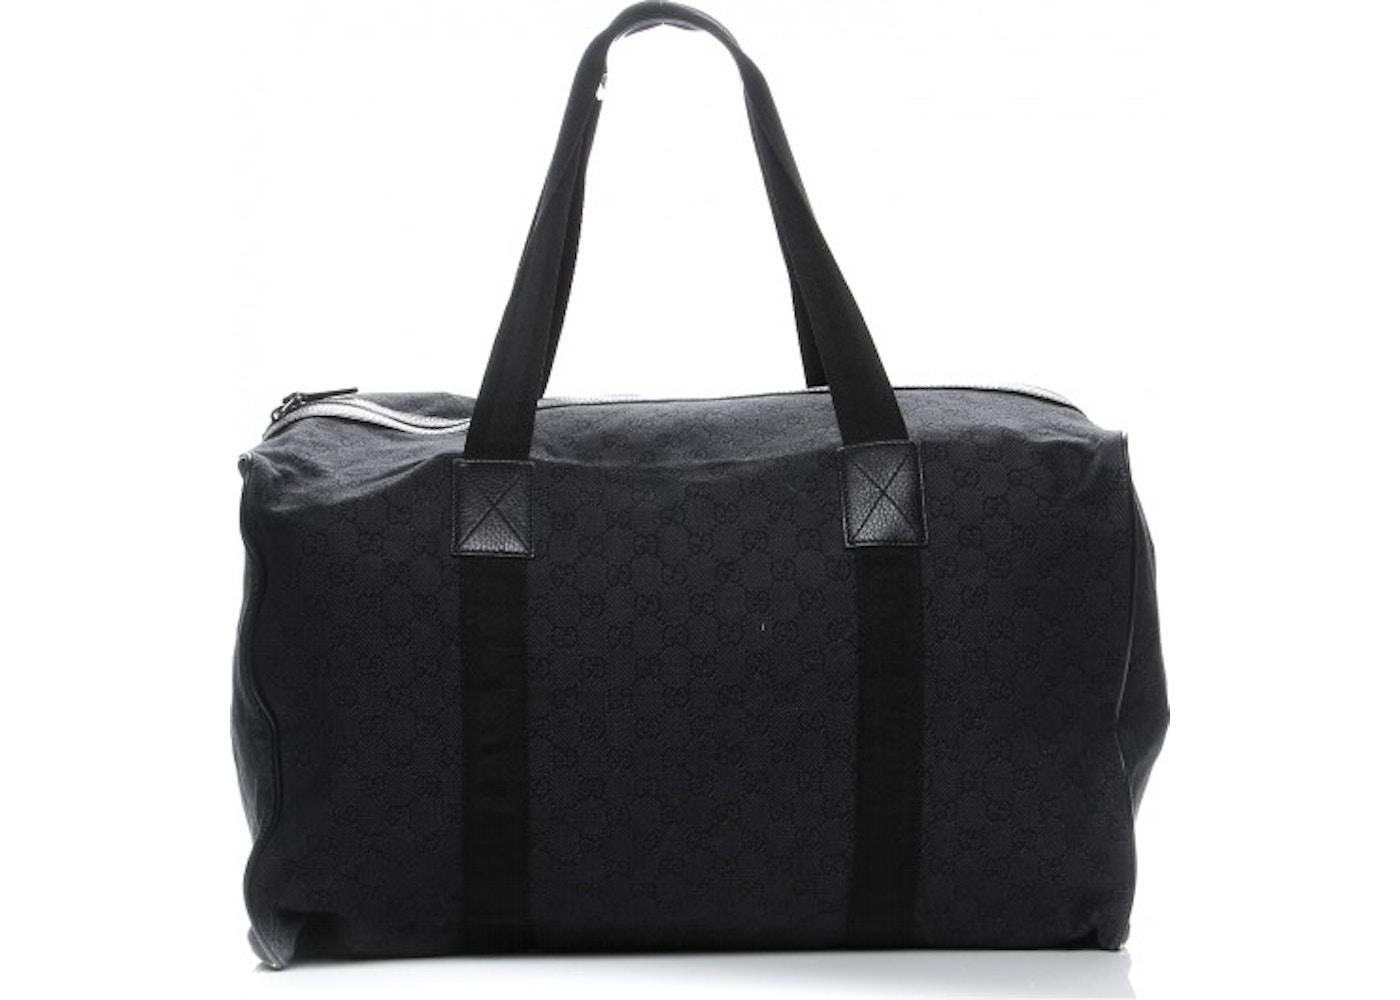 92fbe10b7761 Gucci Carry On Duffle Bag Monogram GG Large Black. Monogram GG Large Black